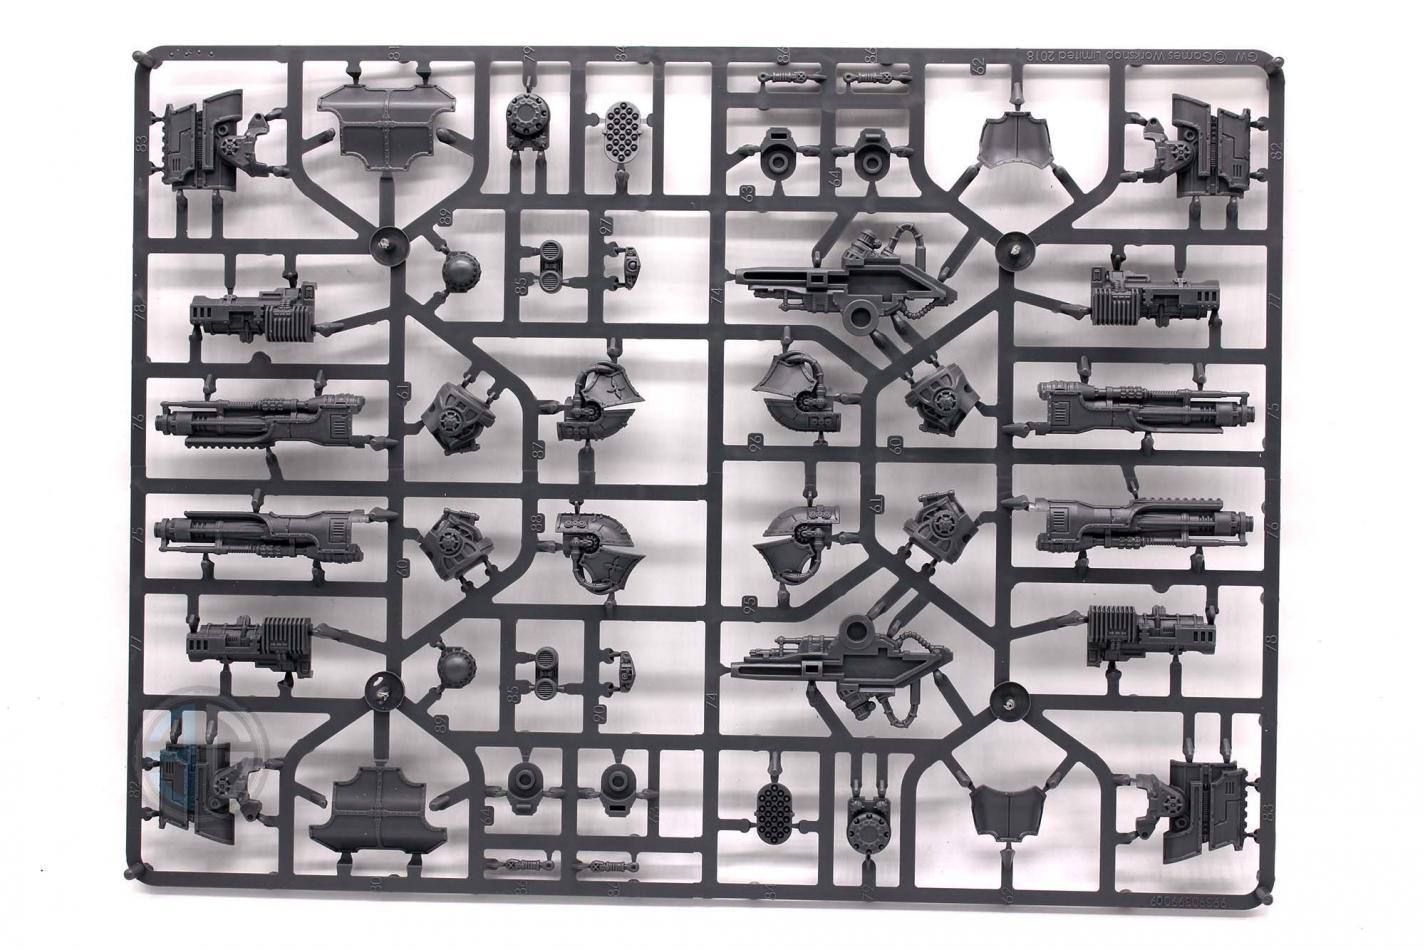 Adeptus Titanicus Titan Battlegroup - New Releases | Element